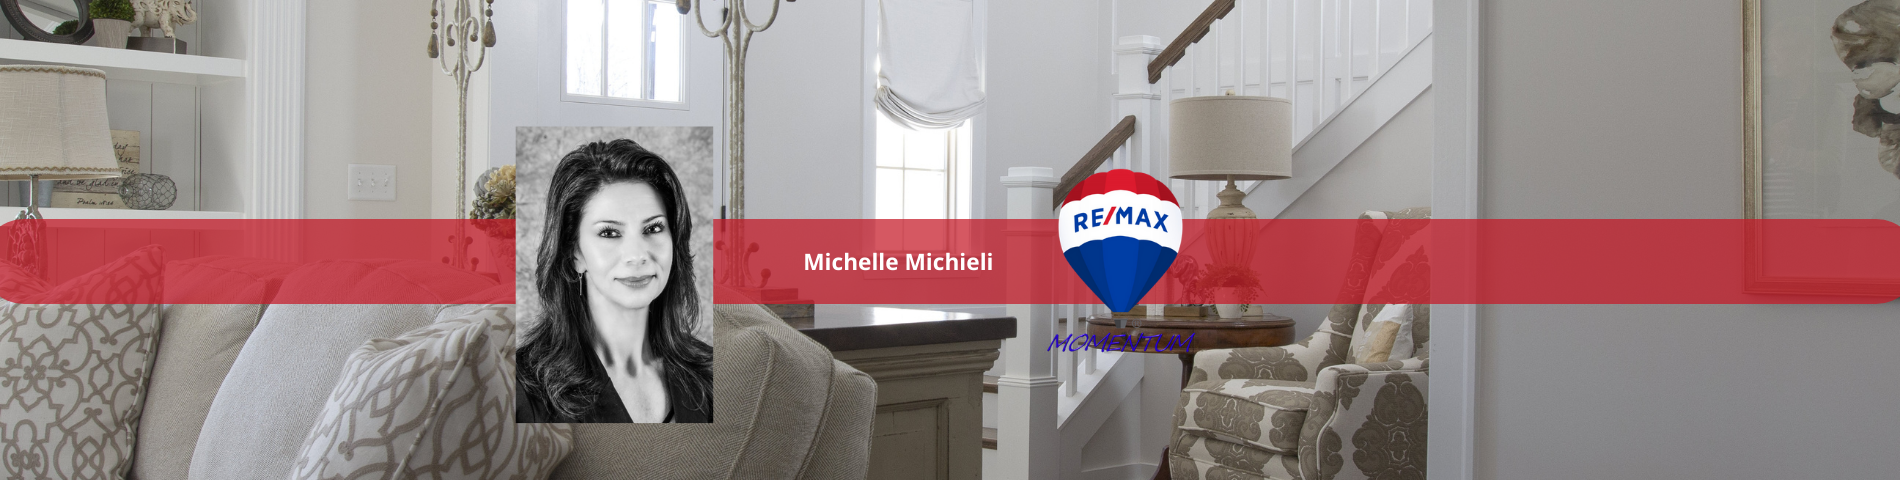 Michelle Michieli Real Estate Agent Remax Sell/Buy a Home